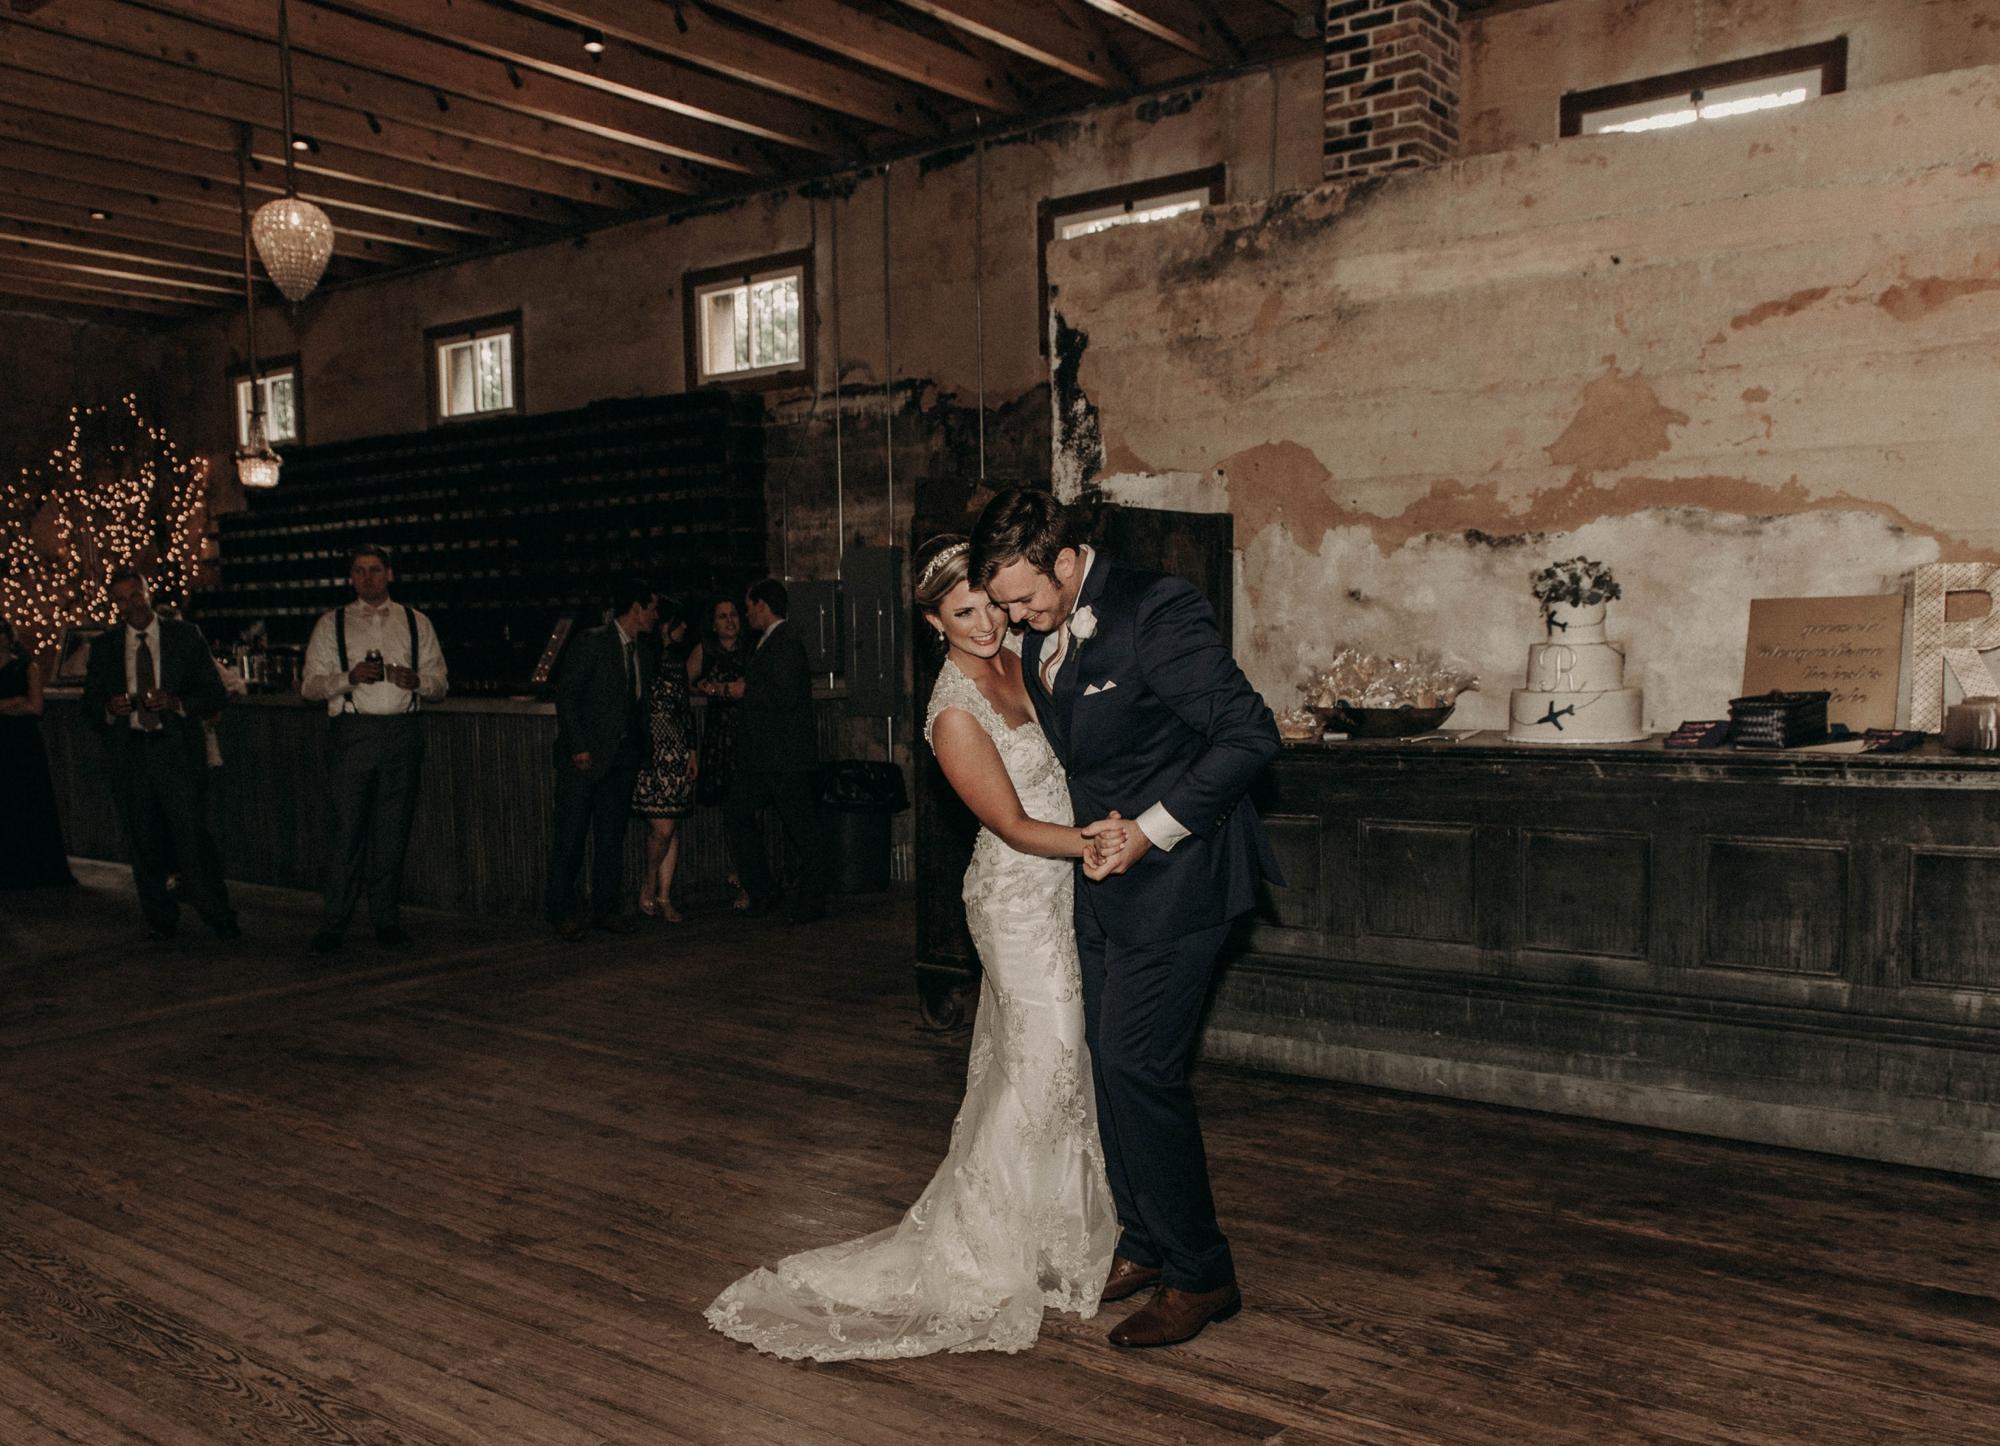 austin-texas-wedding-photography-1778-photographie-26.jpg